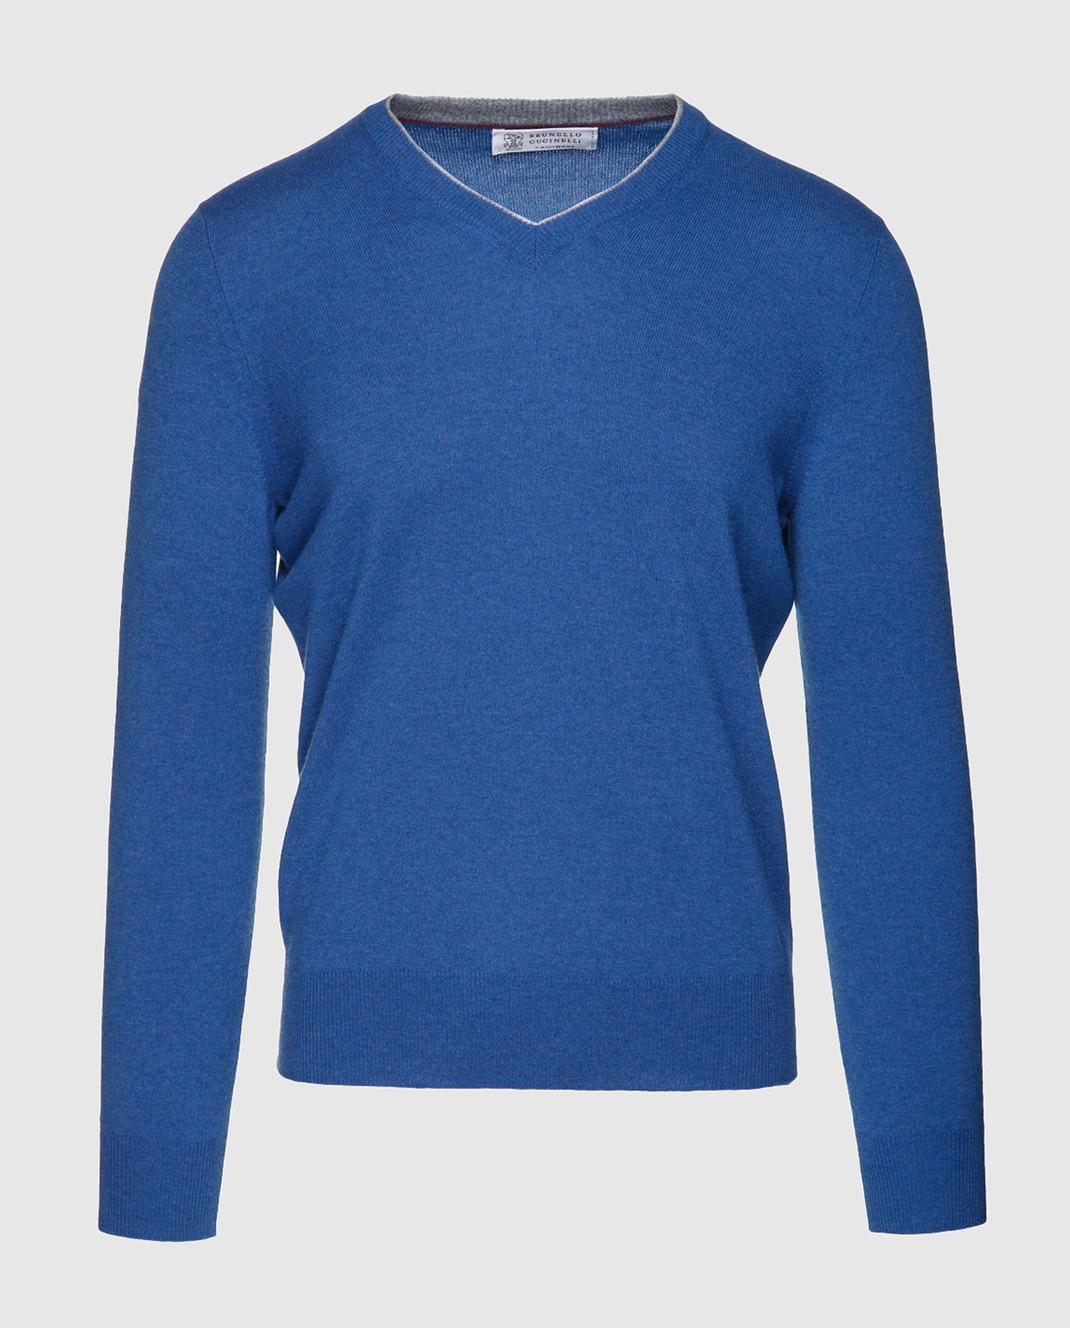 Brunello Cucinelli Синий пуловер M2200162